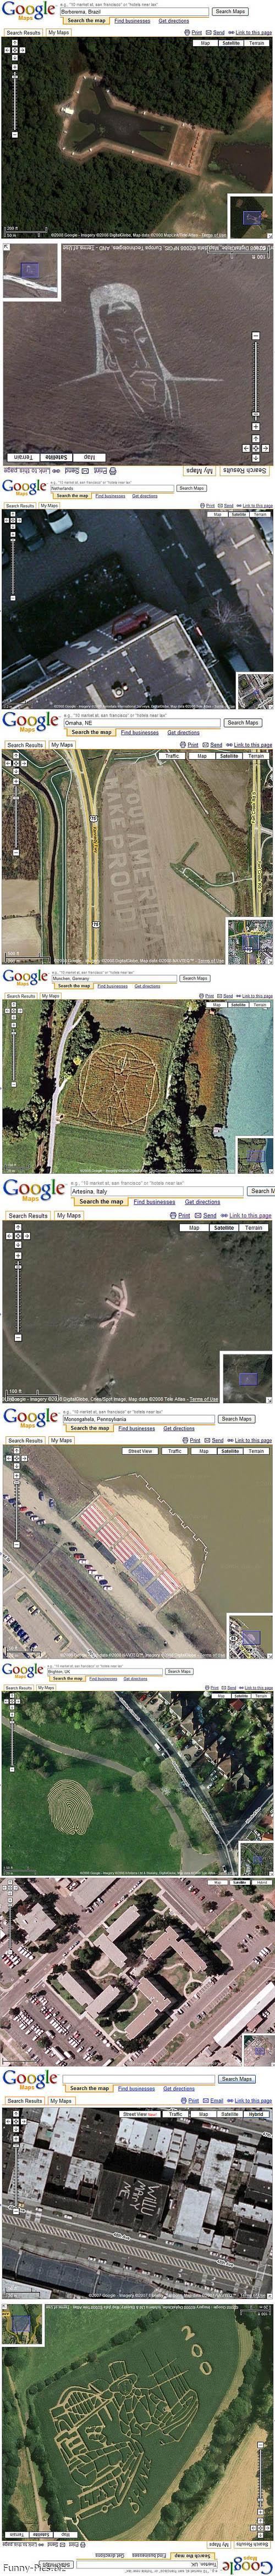 Tricks to Google Map